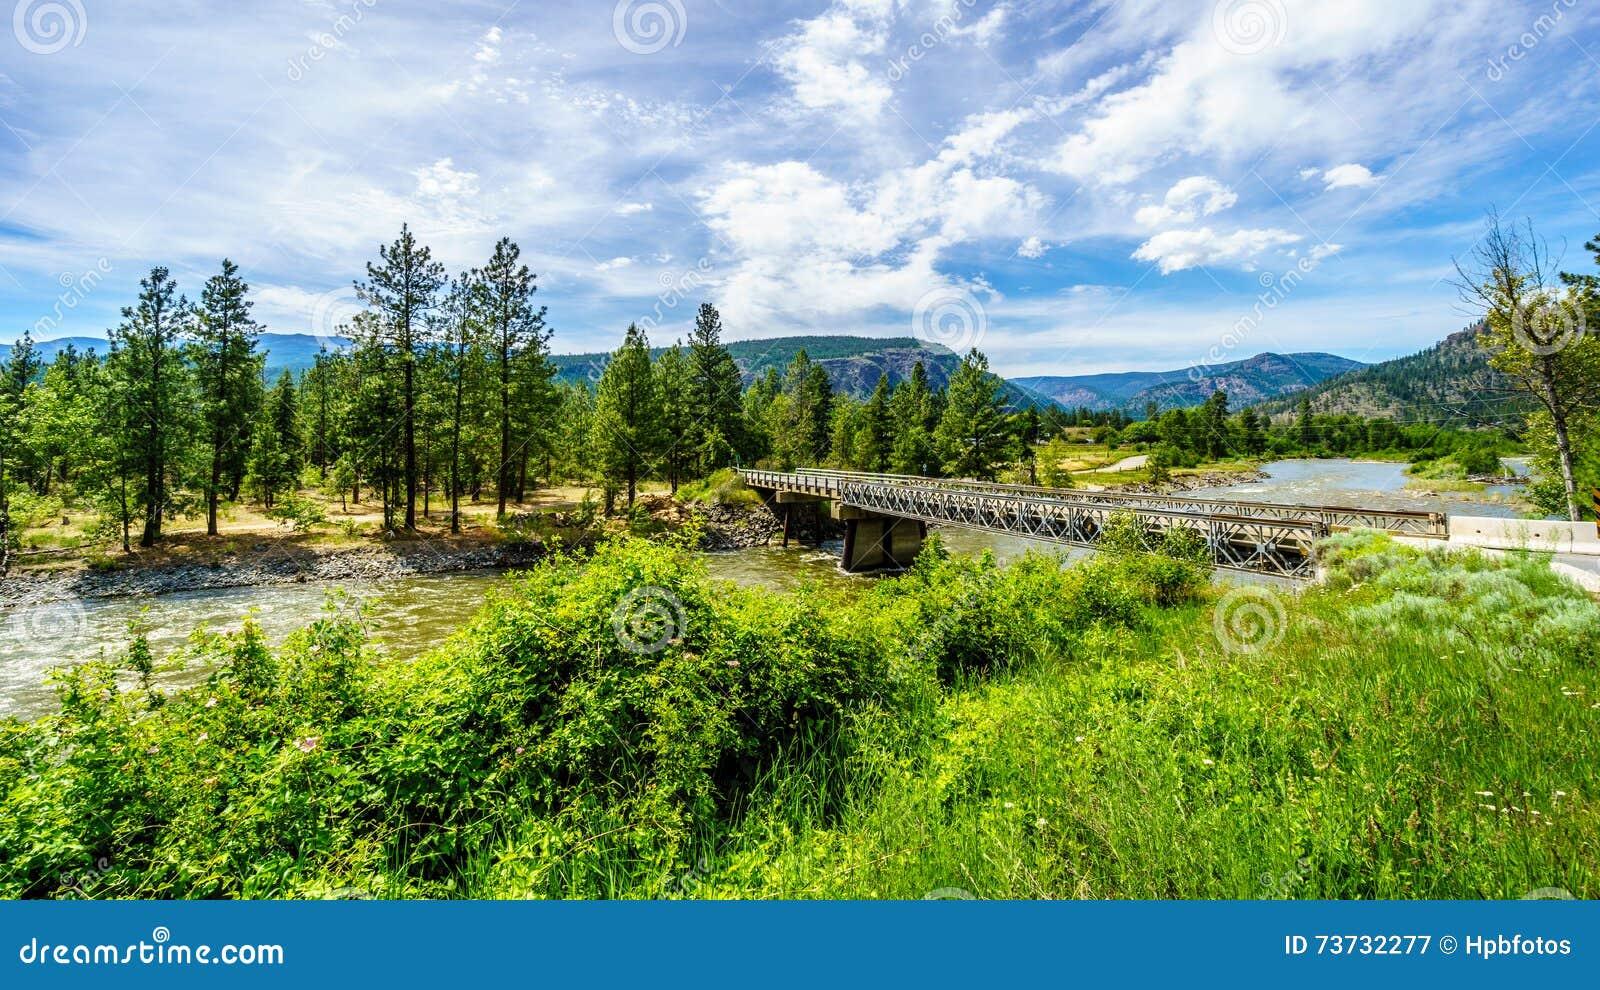 Trestle Bridge over the Nicola River as it flows along Highway 8